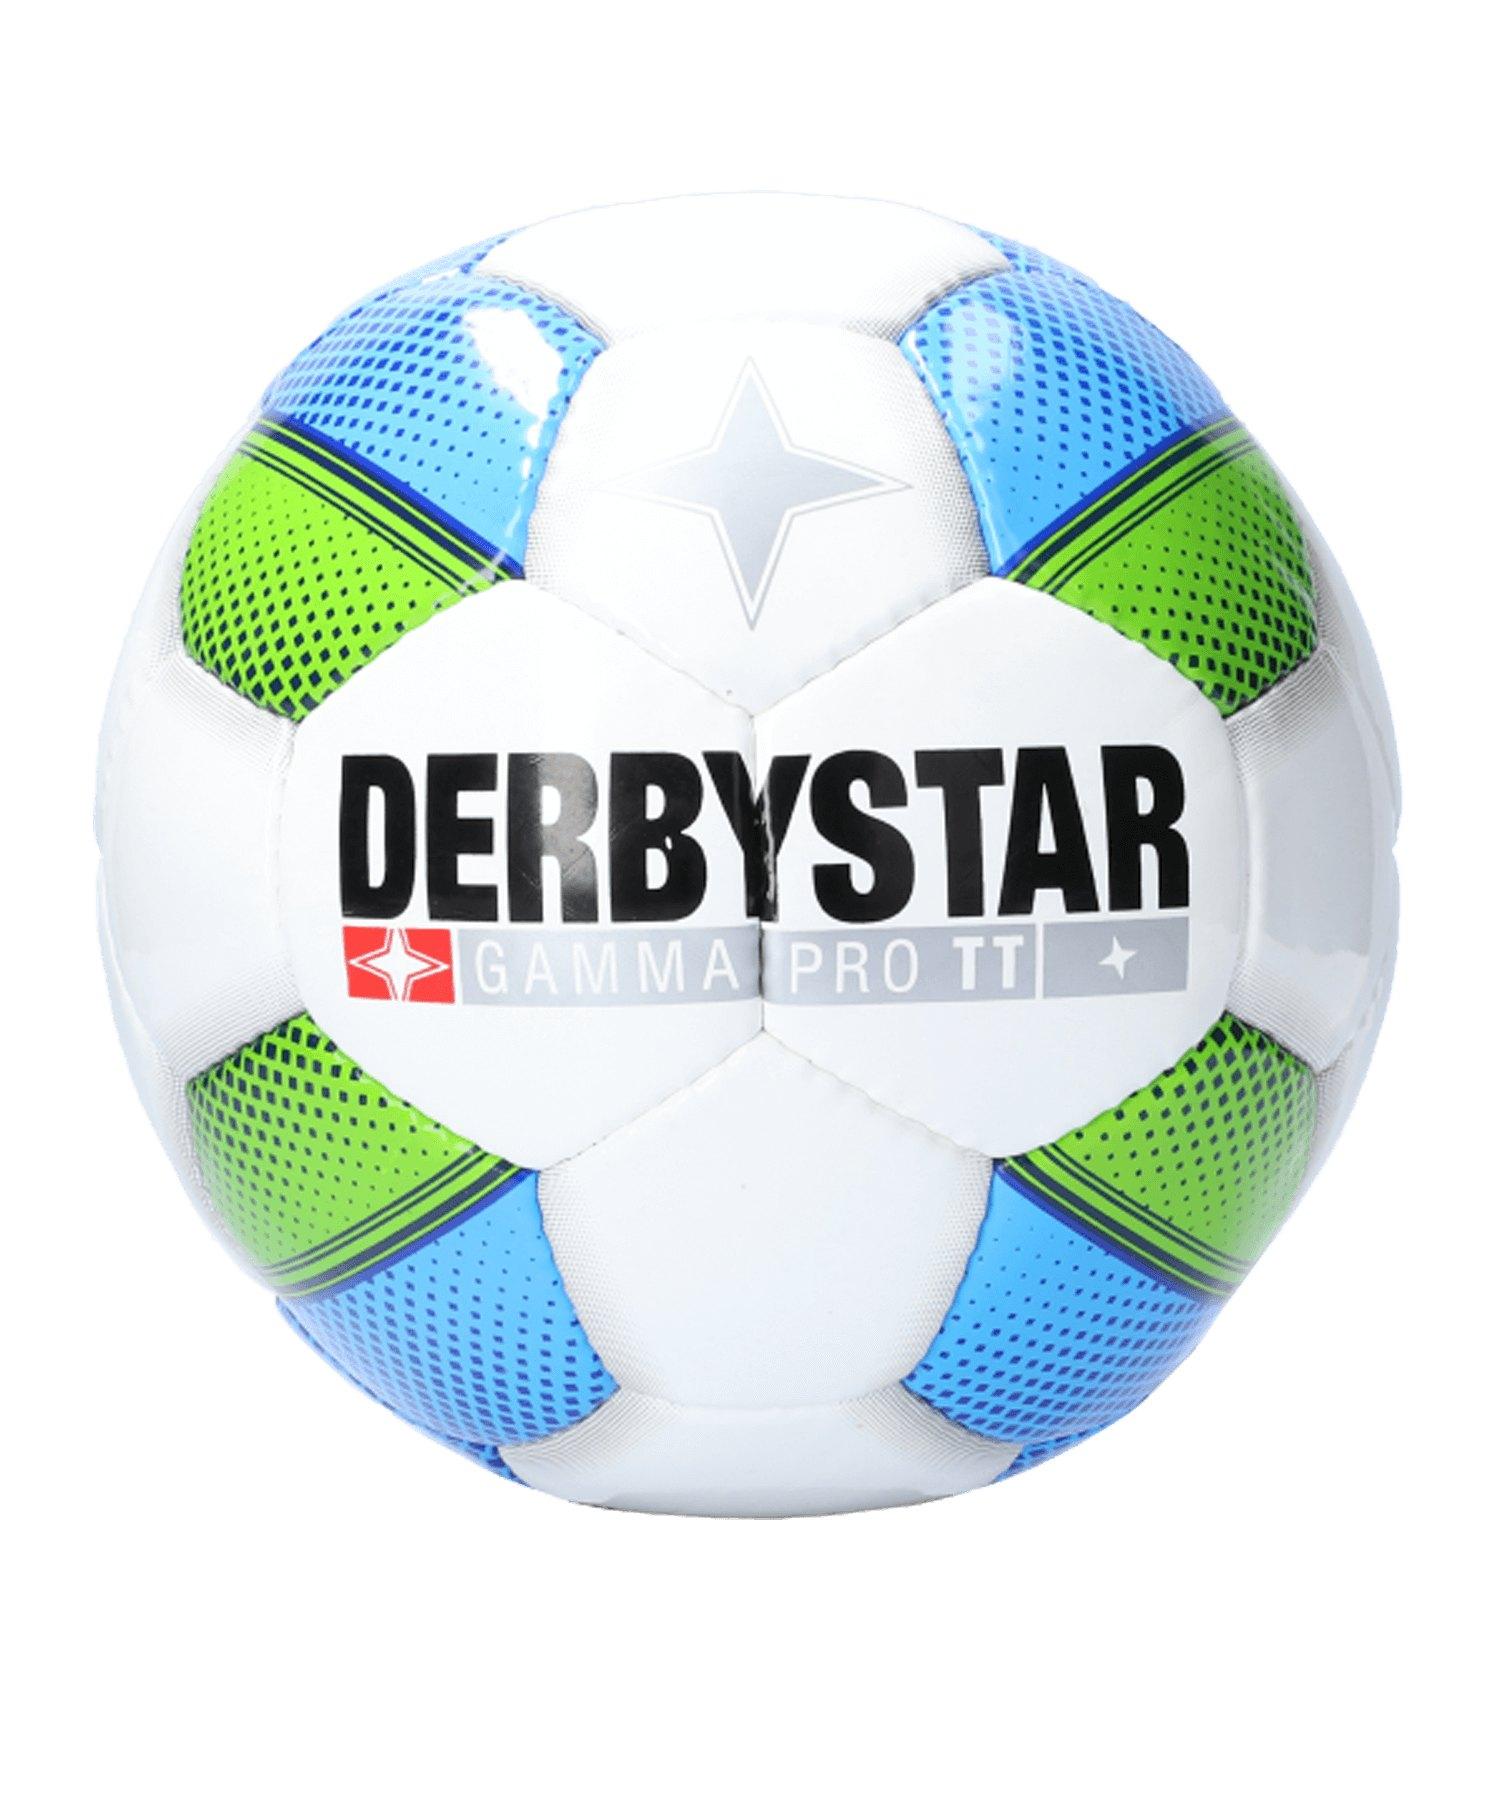 Derbystar Gamma Pro TT Trainingsball Weiss F164 - weiss